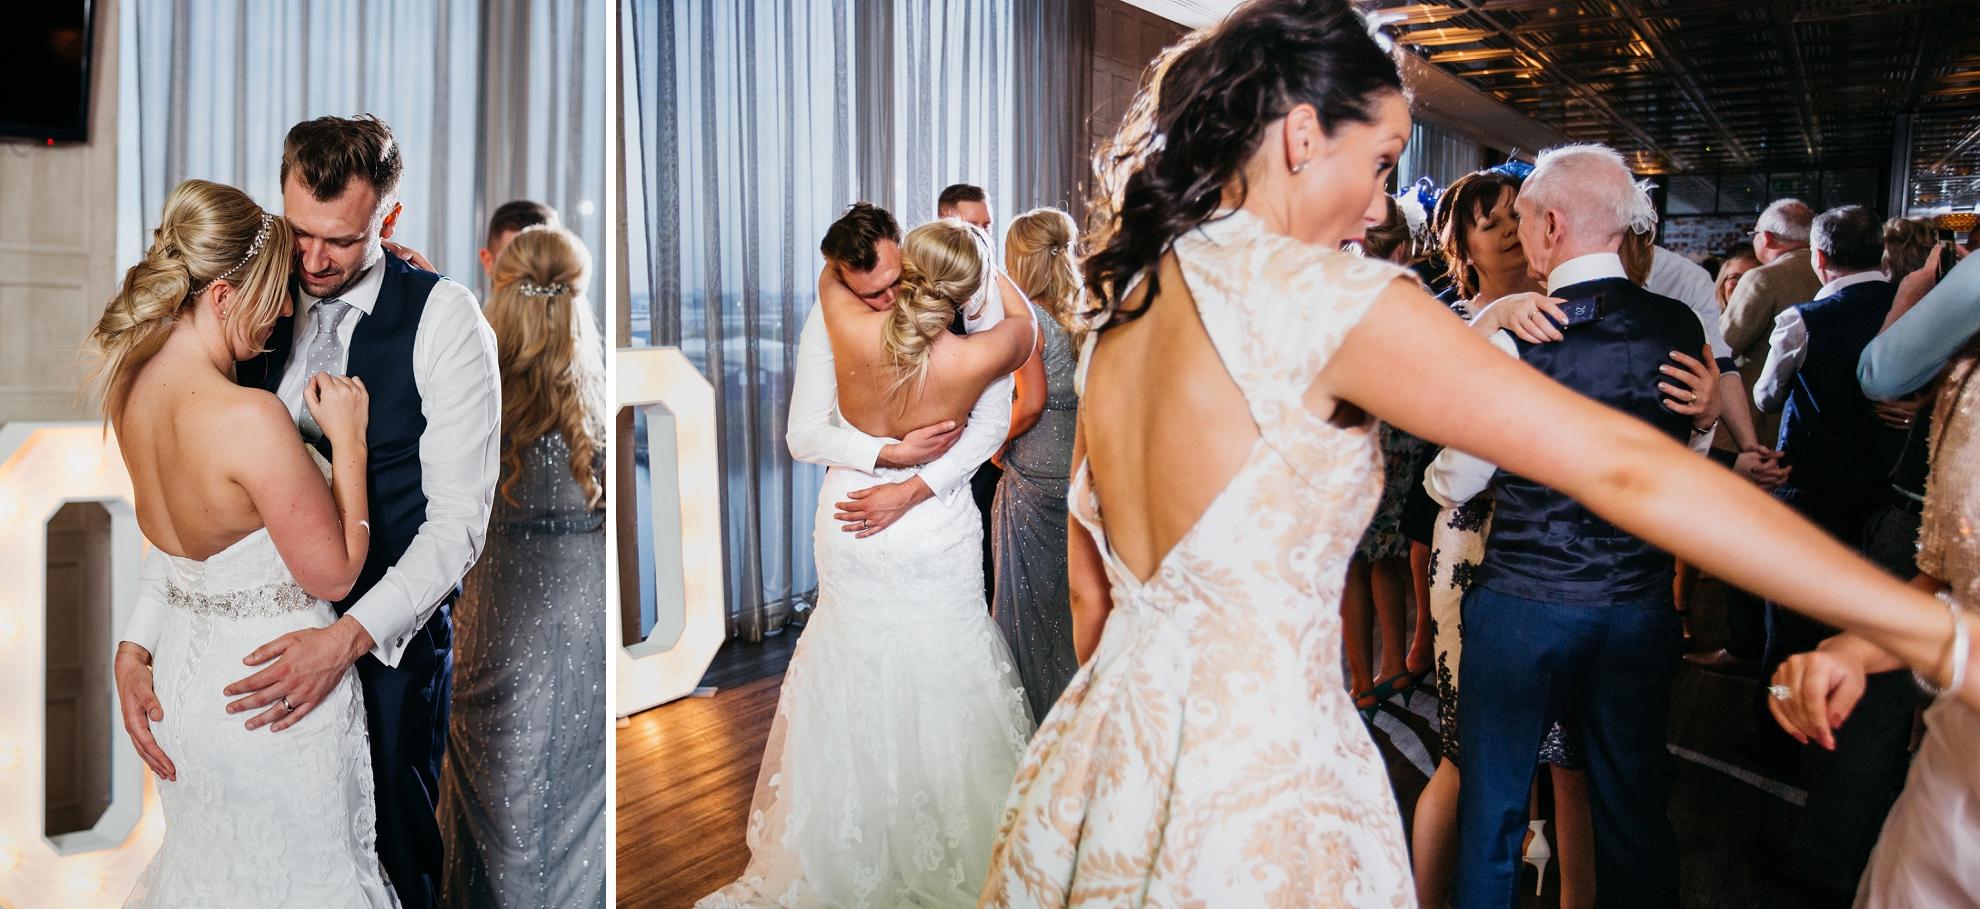 On the 7th Weddings